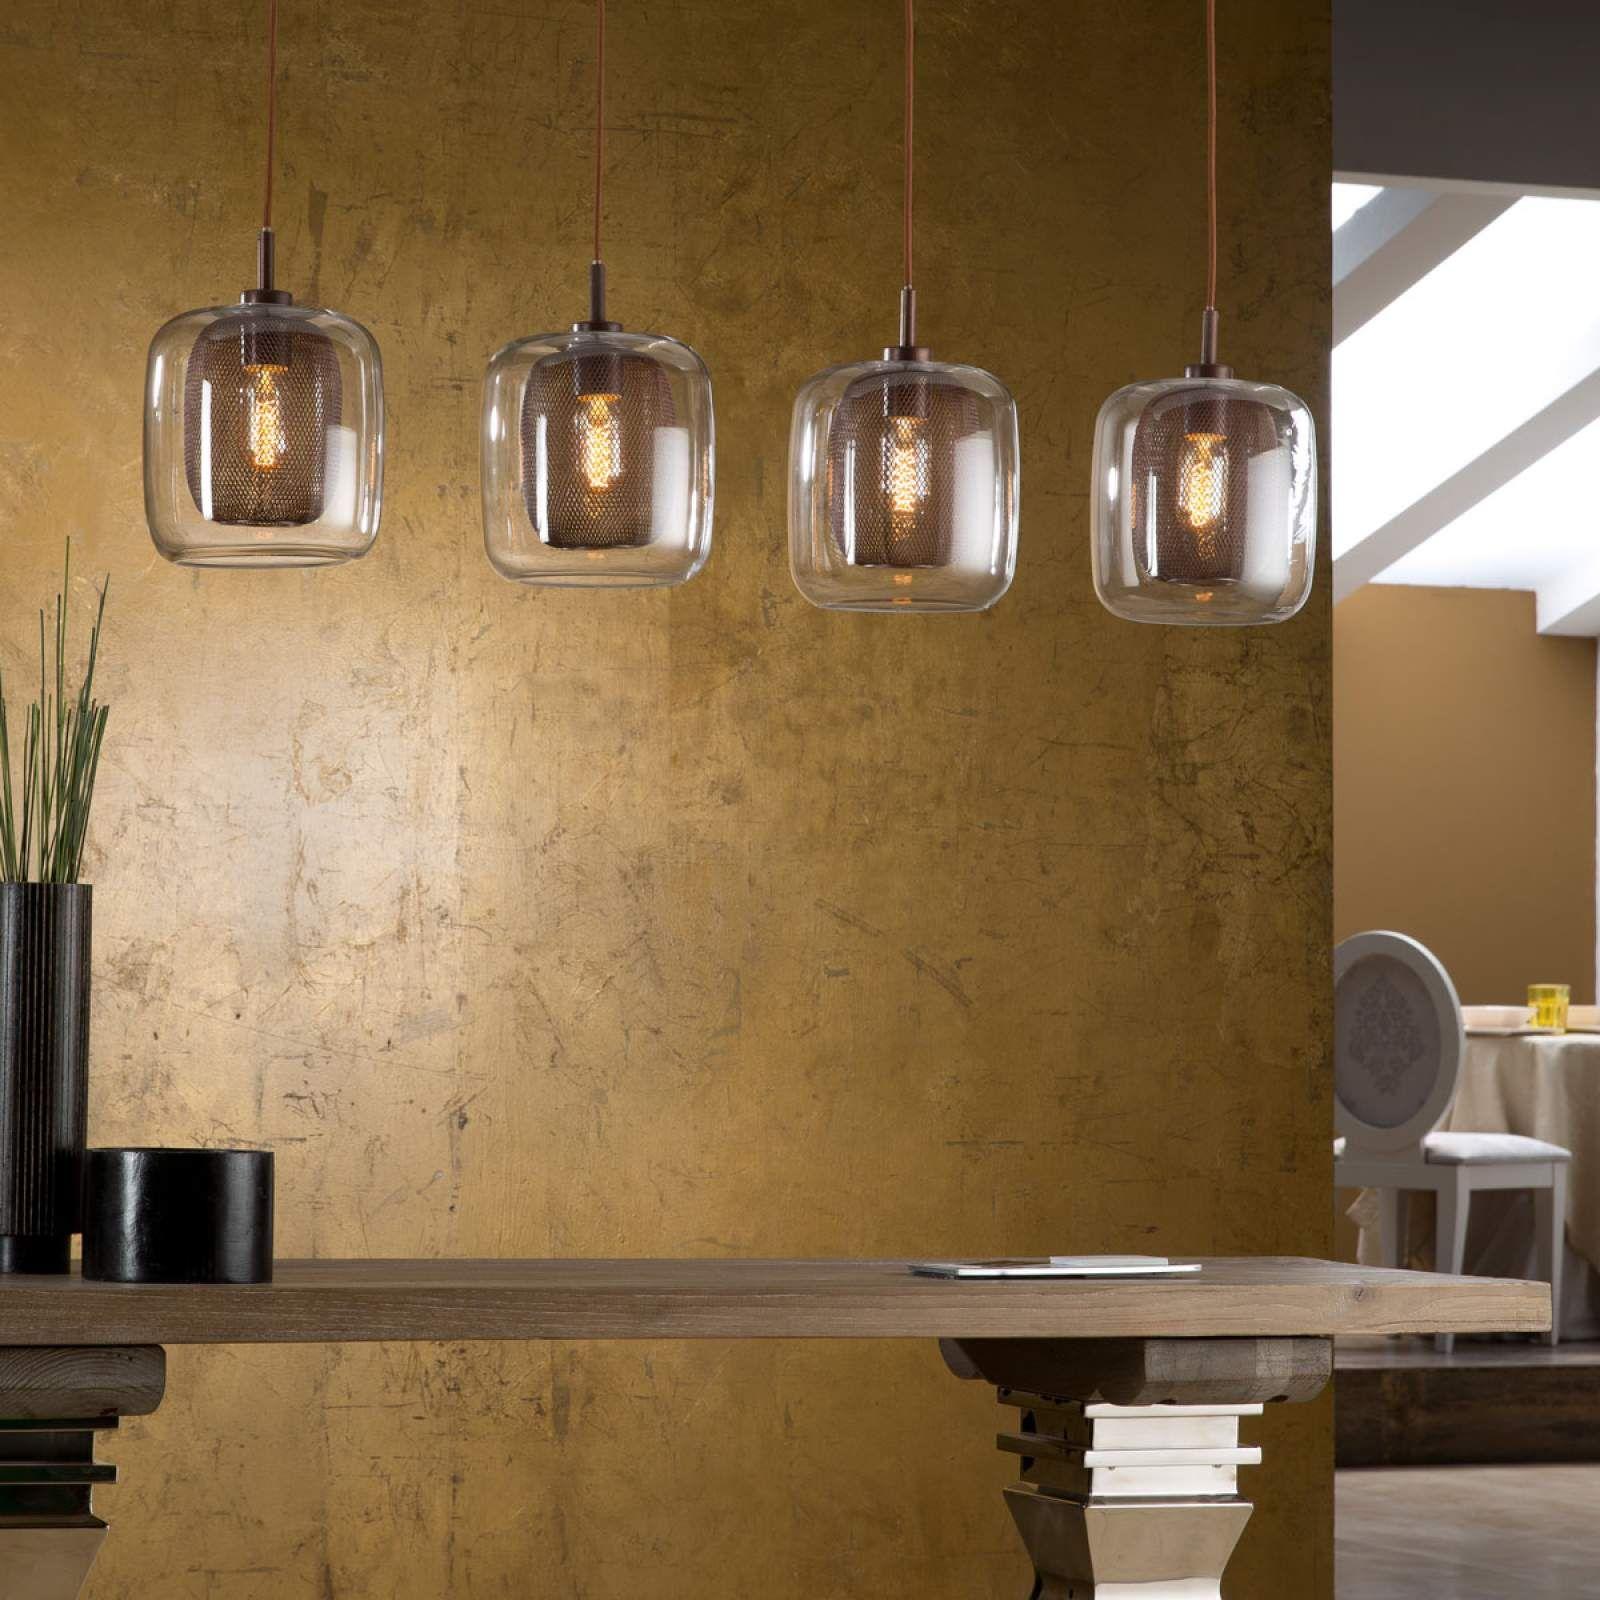 4 Flammige Hangeleuchte Fox Mit Doppelschirmen Lampen Lampen Und Leuchten Und Leuchten